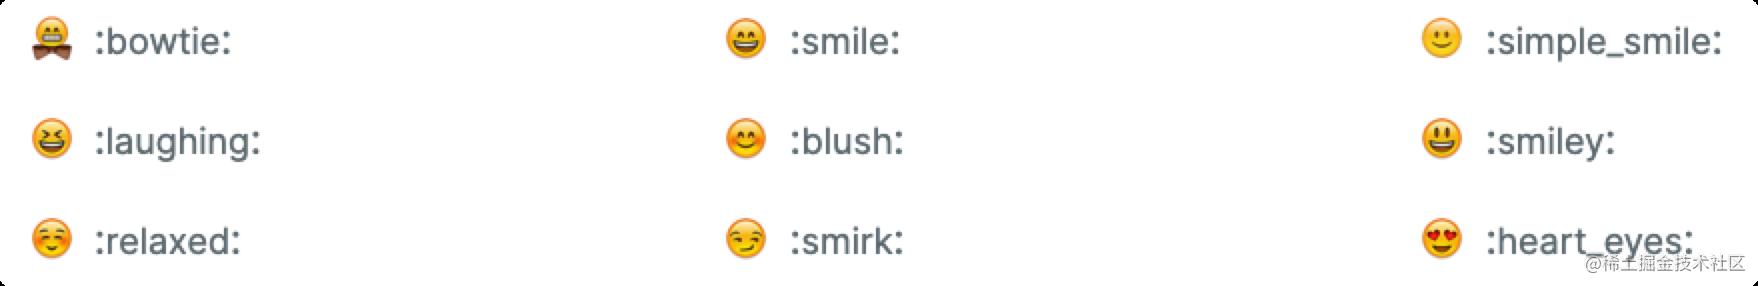 emoji-chat-sheet.png